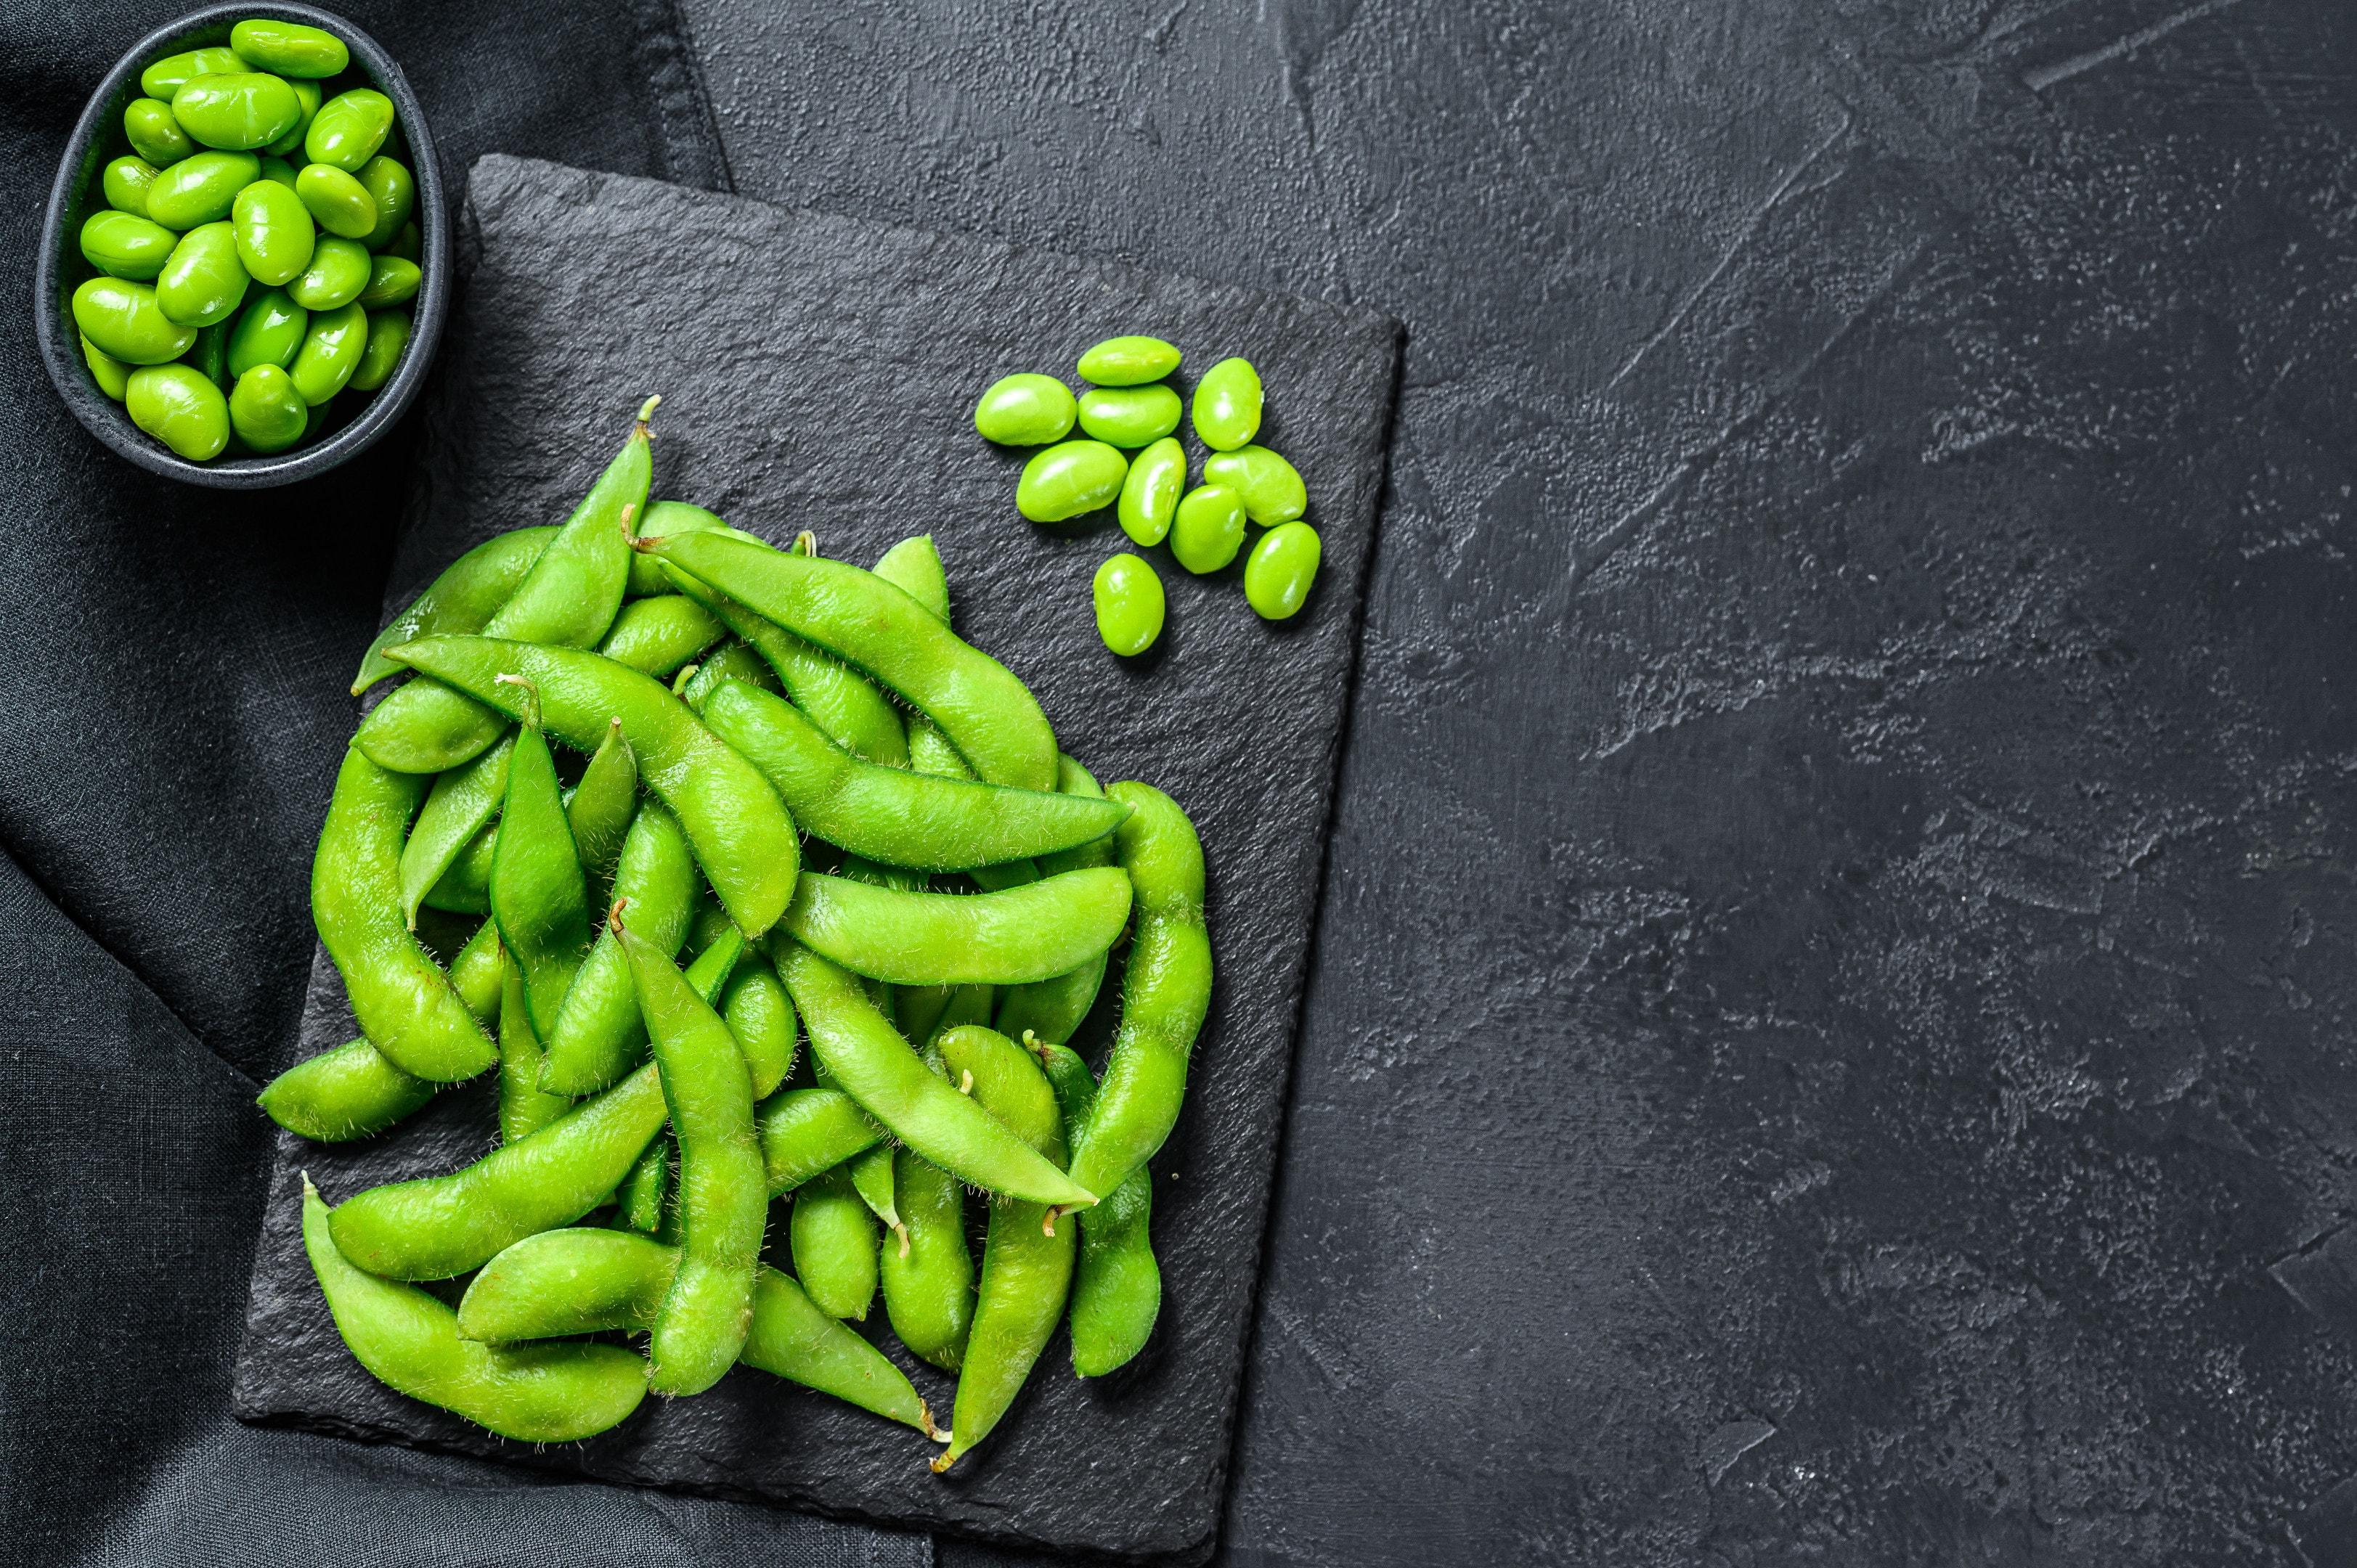 Green soy beans edamame